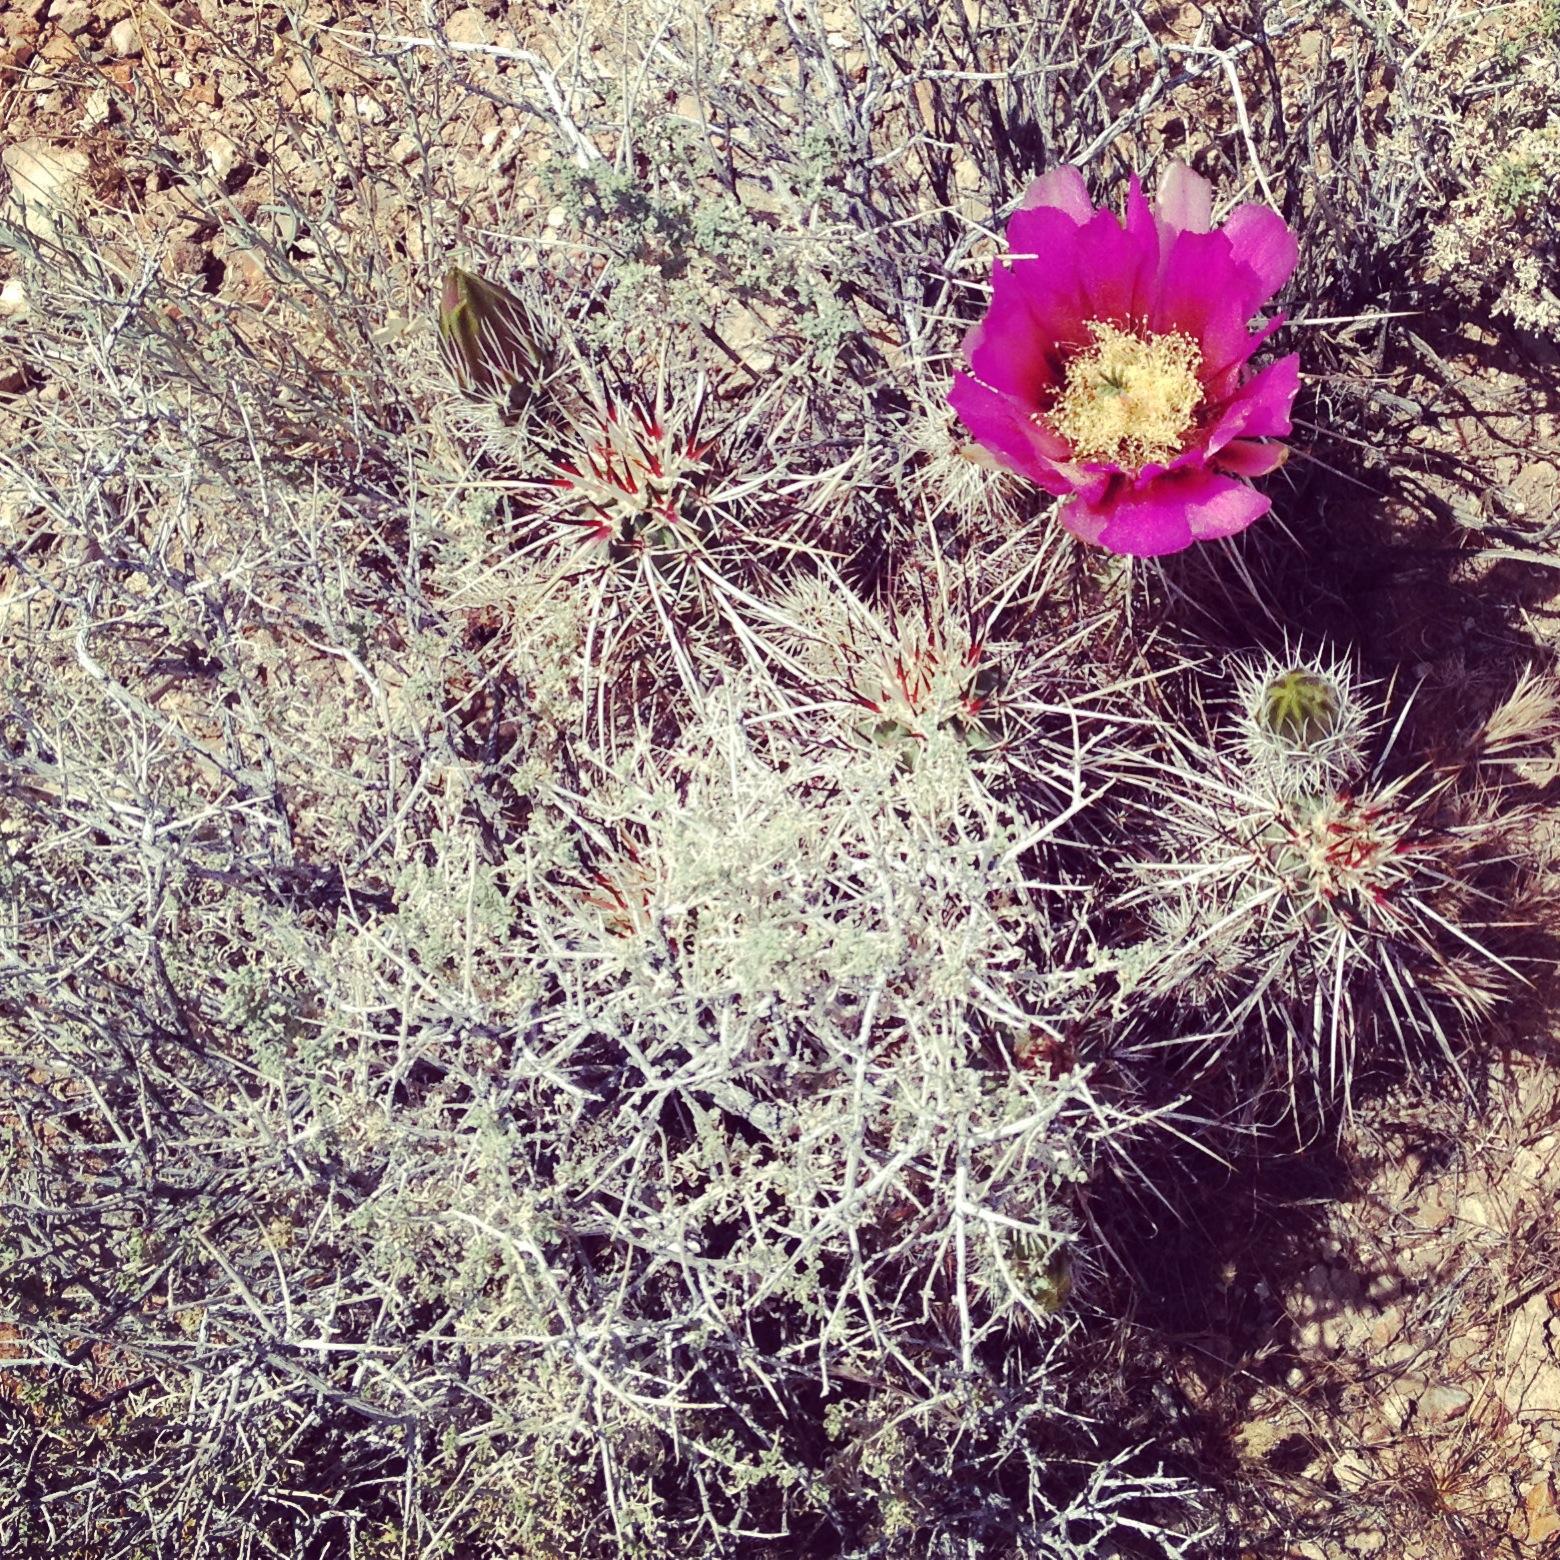 desert-hot-springs-cactus-bloom.JPG